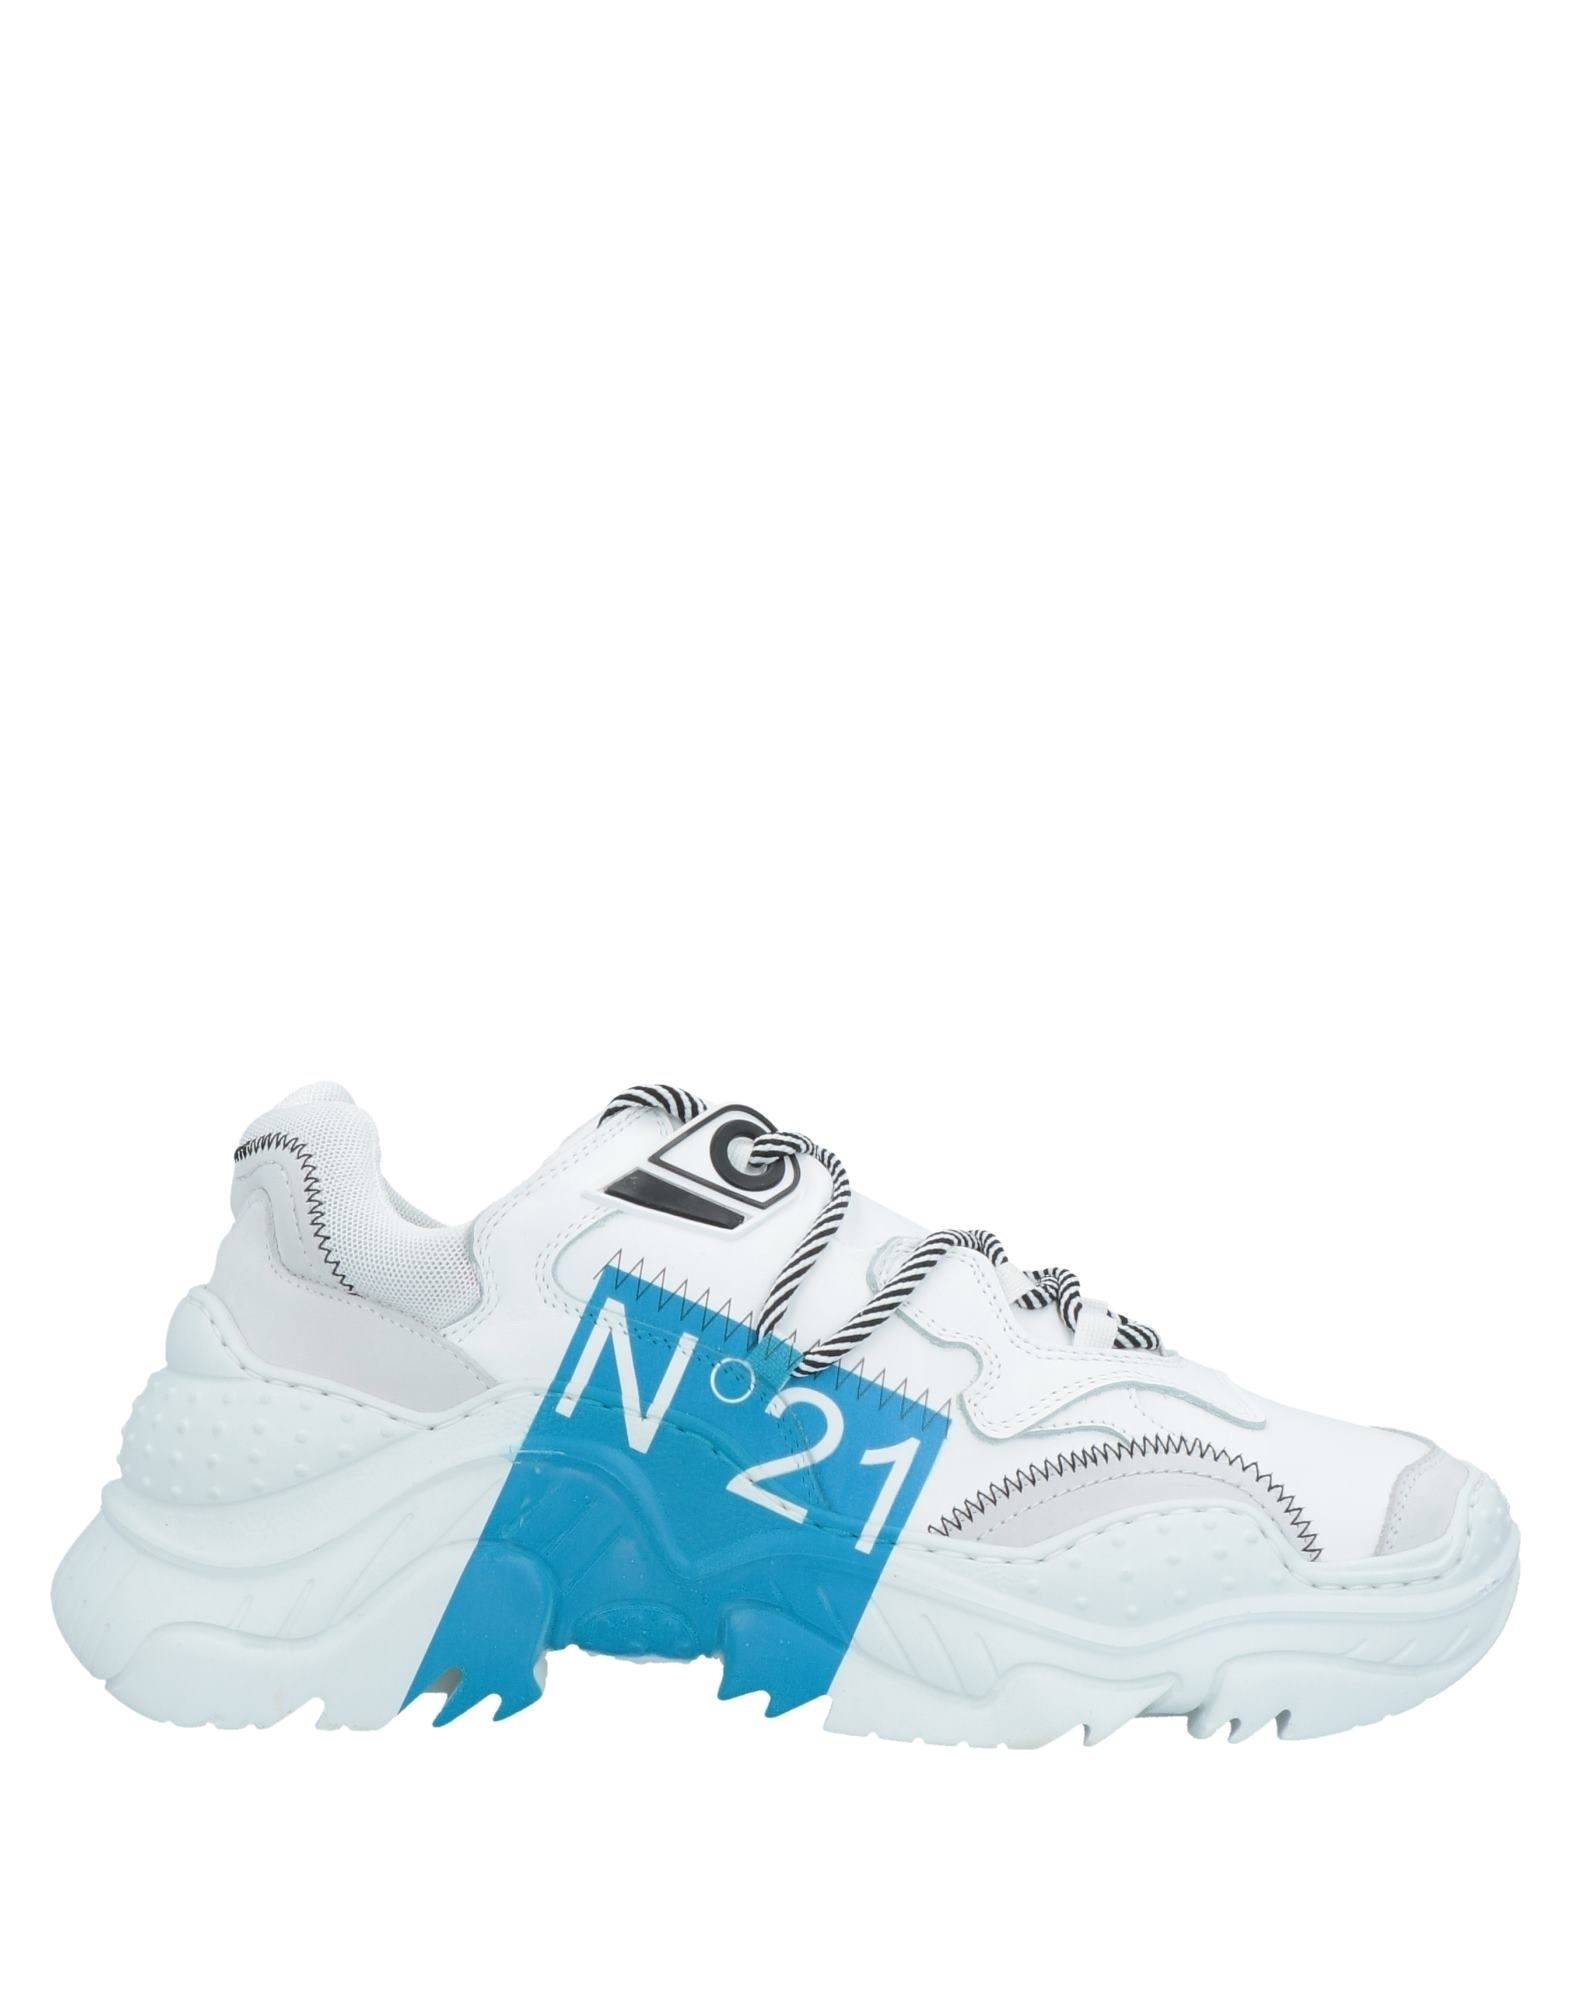 Ndegree21 Low-tops & sneakers - Item 11977988